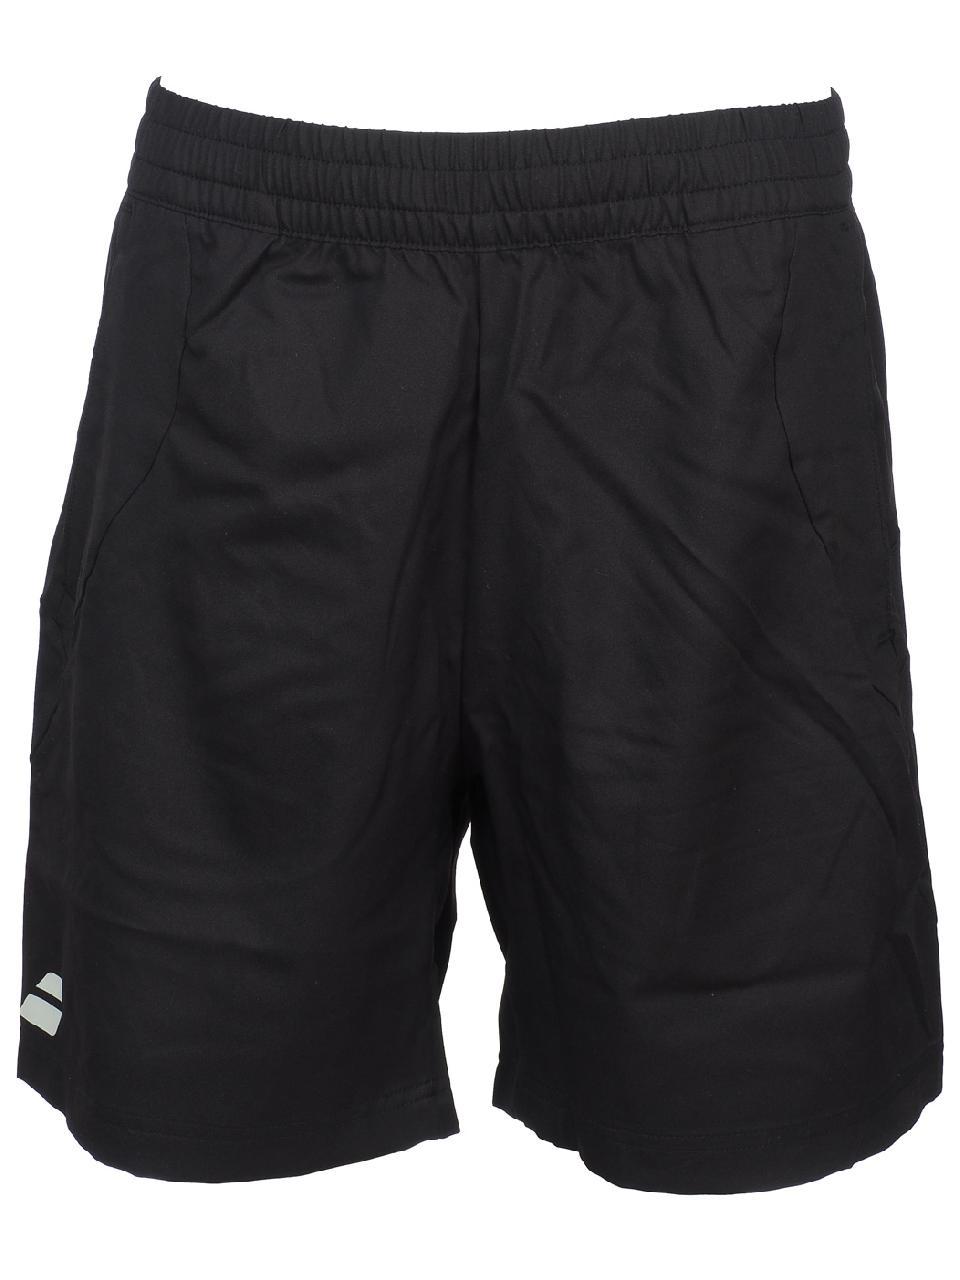 short-Tennis-Babolat-Shorts-Spiel-Core-Blk-Schwarz-70095-Neu Indexbild 4